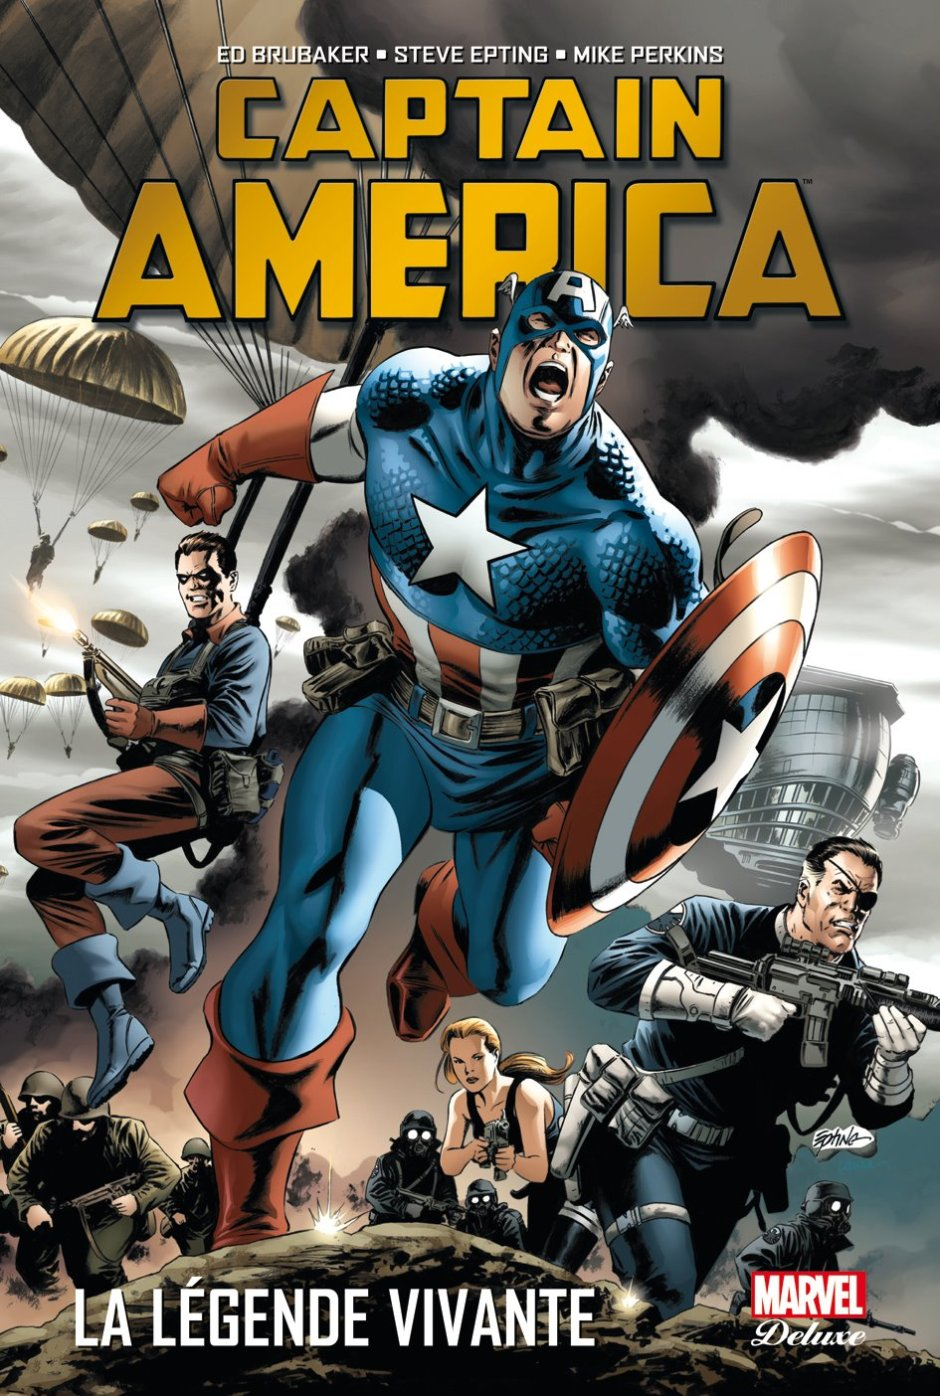 img_comics_4137_captain-america-legende-vivante